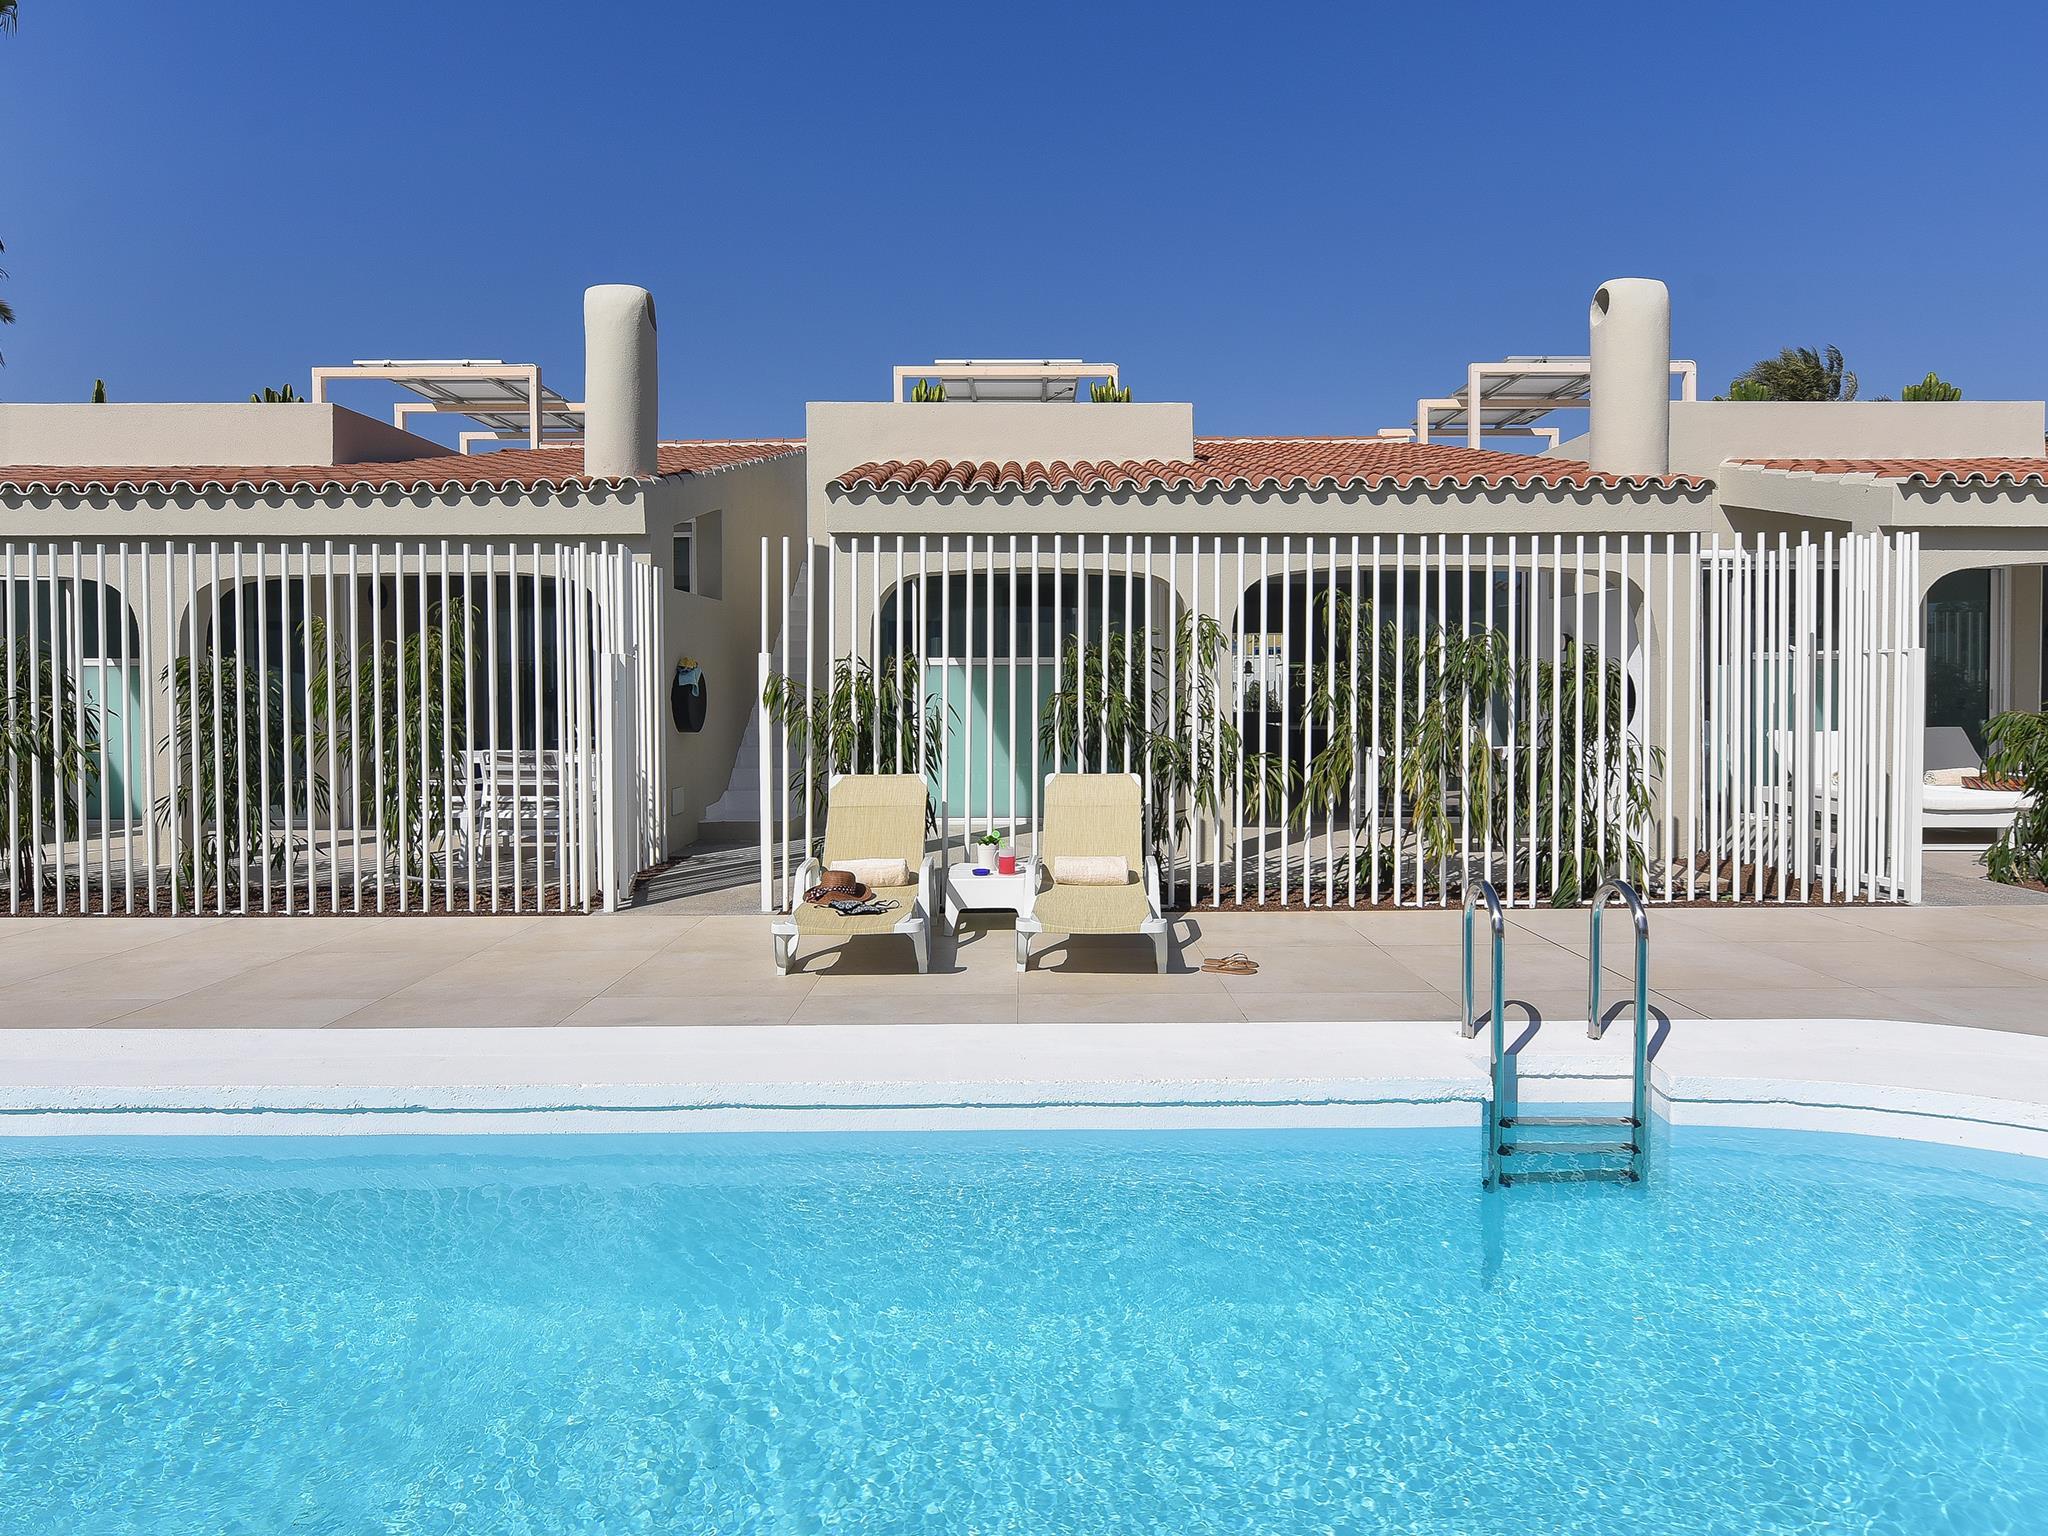 New VelSuites Playa del Ingles I Bungalow in Spanien